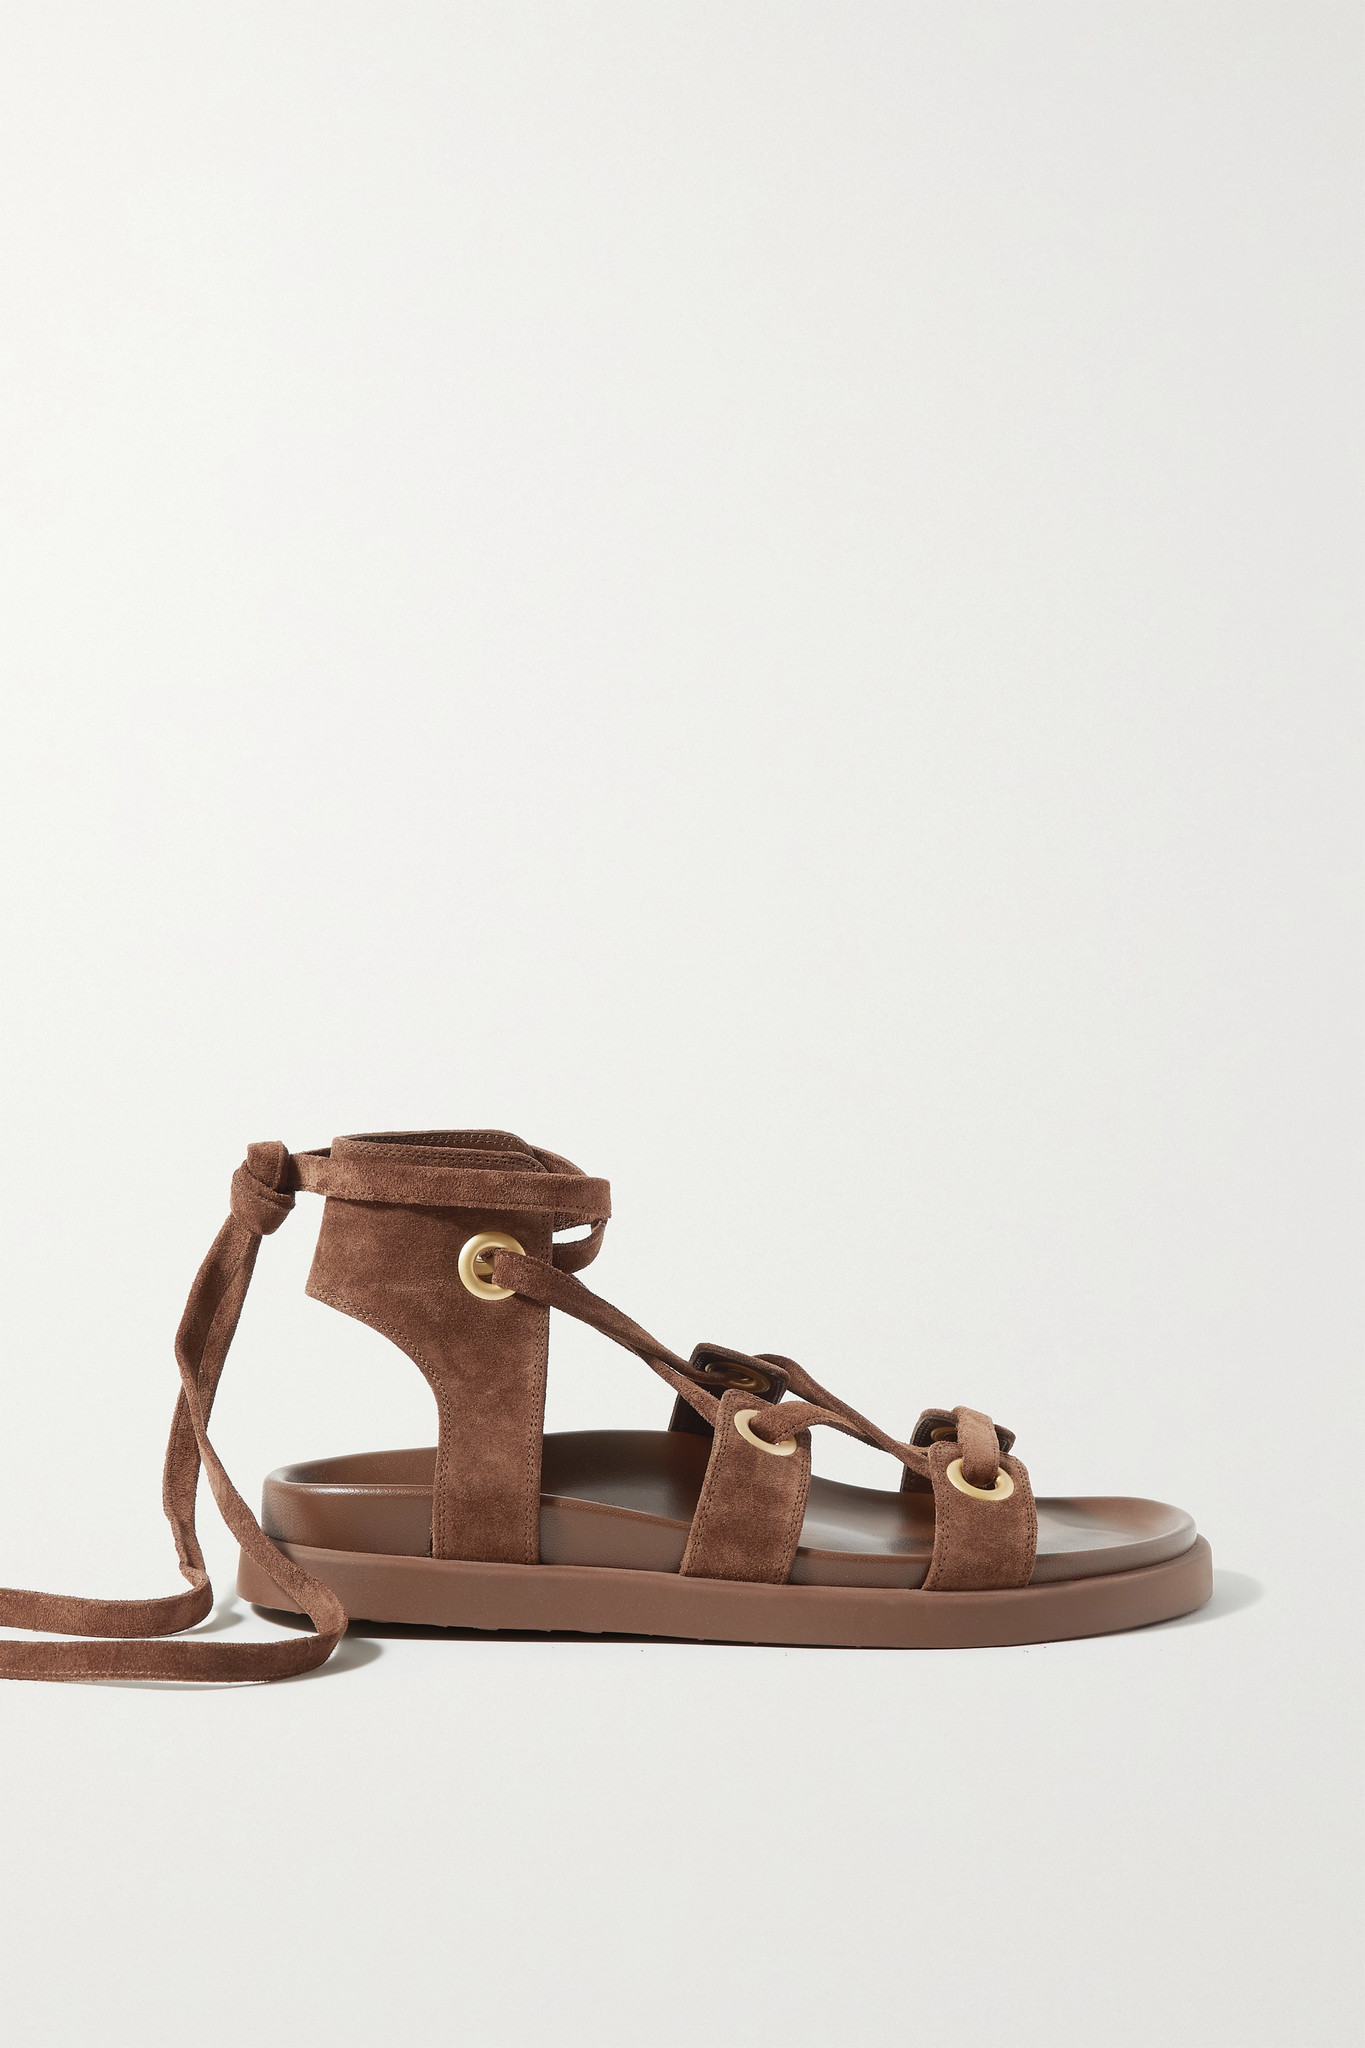 GIANVITO ROSSI - Ibiza 绒面革凉鞋 - 棕色 - IT41